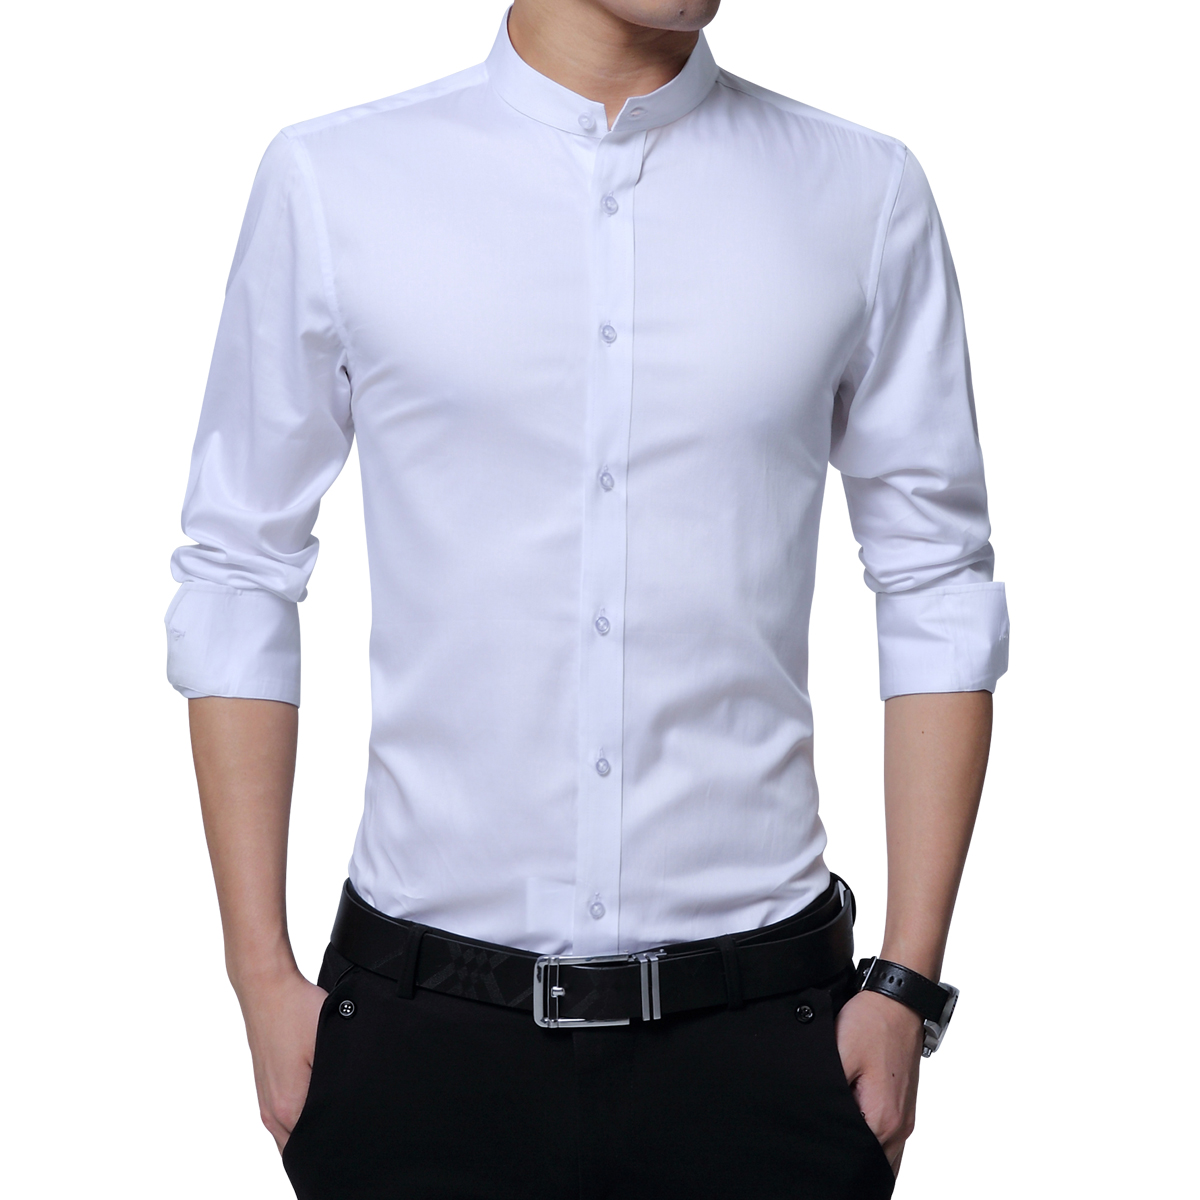 YUNCLOS Men Shirt Fashion Mens Casual Shirts Long Sleeve Slim Fit Grandad Collar Formal White Black Blue Tuxedo Shirts